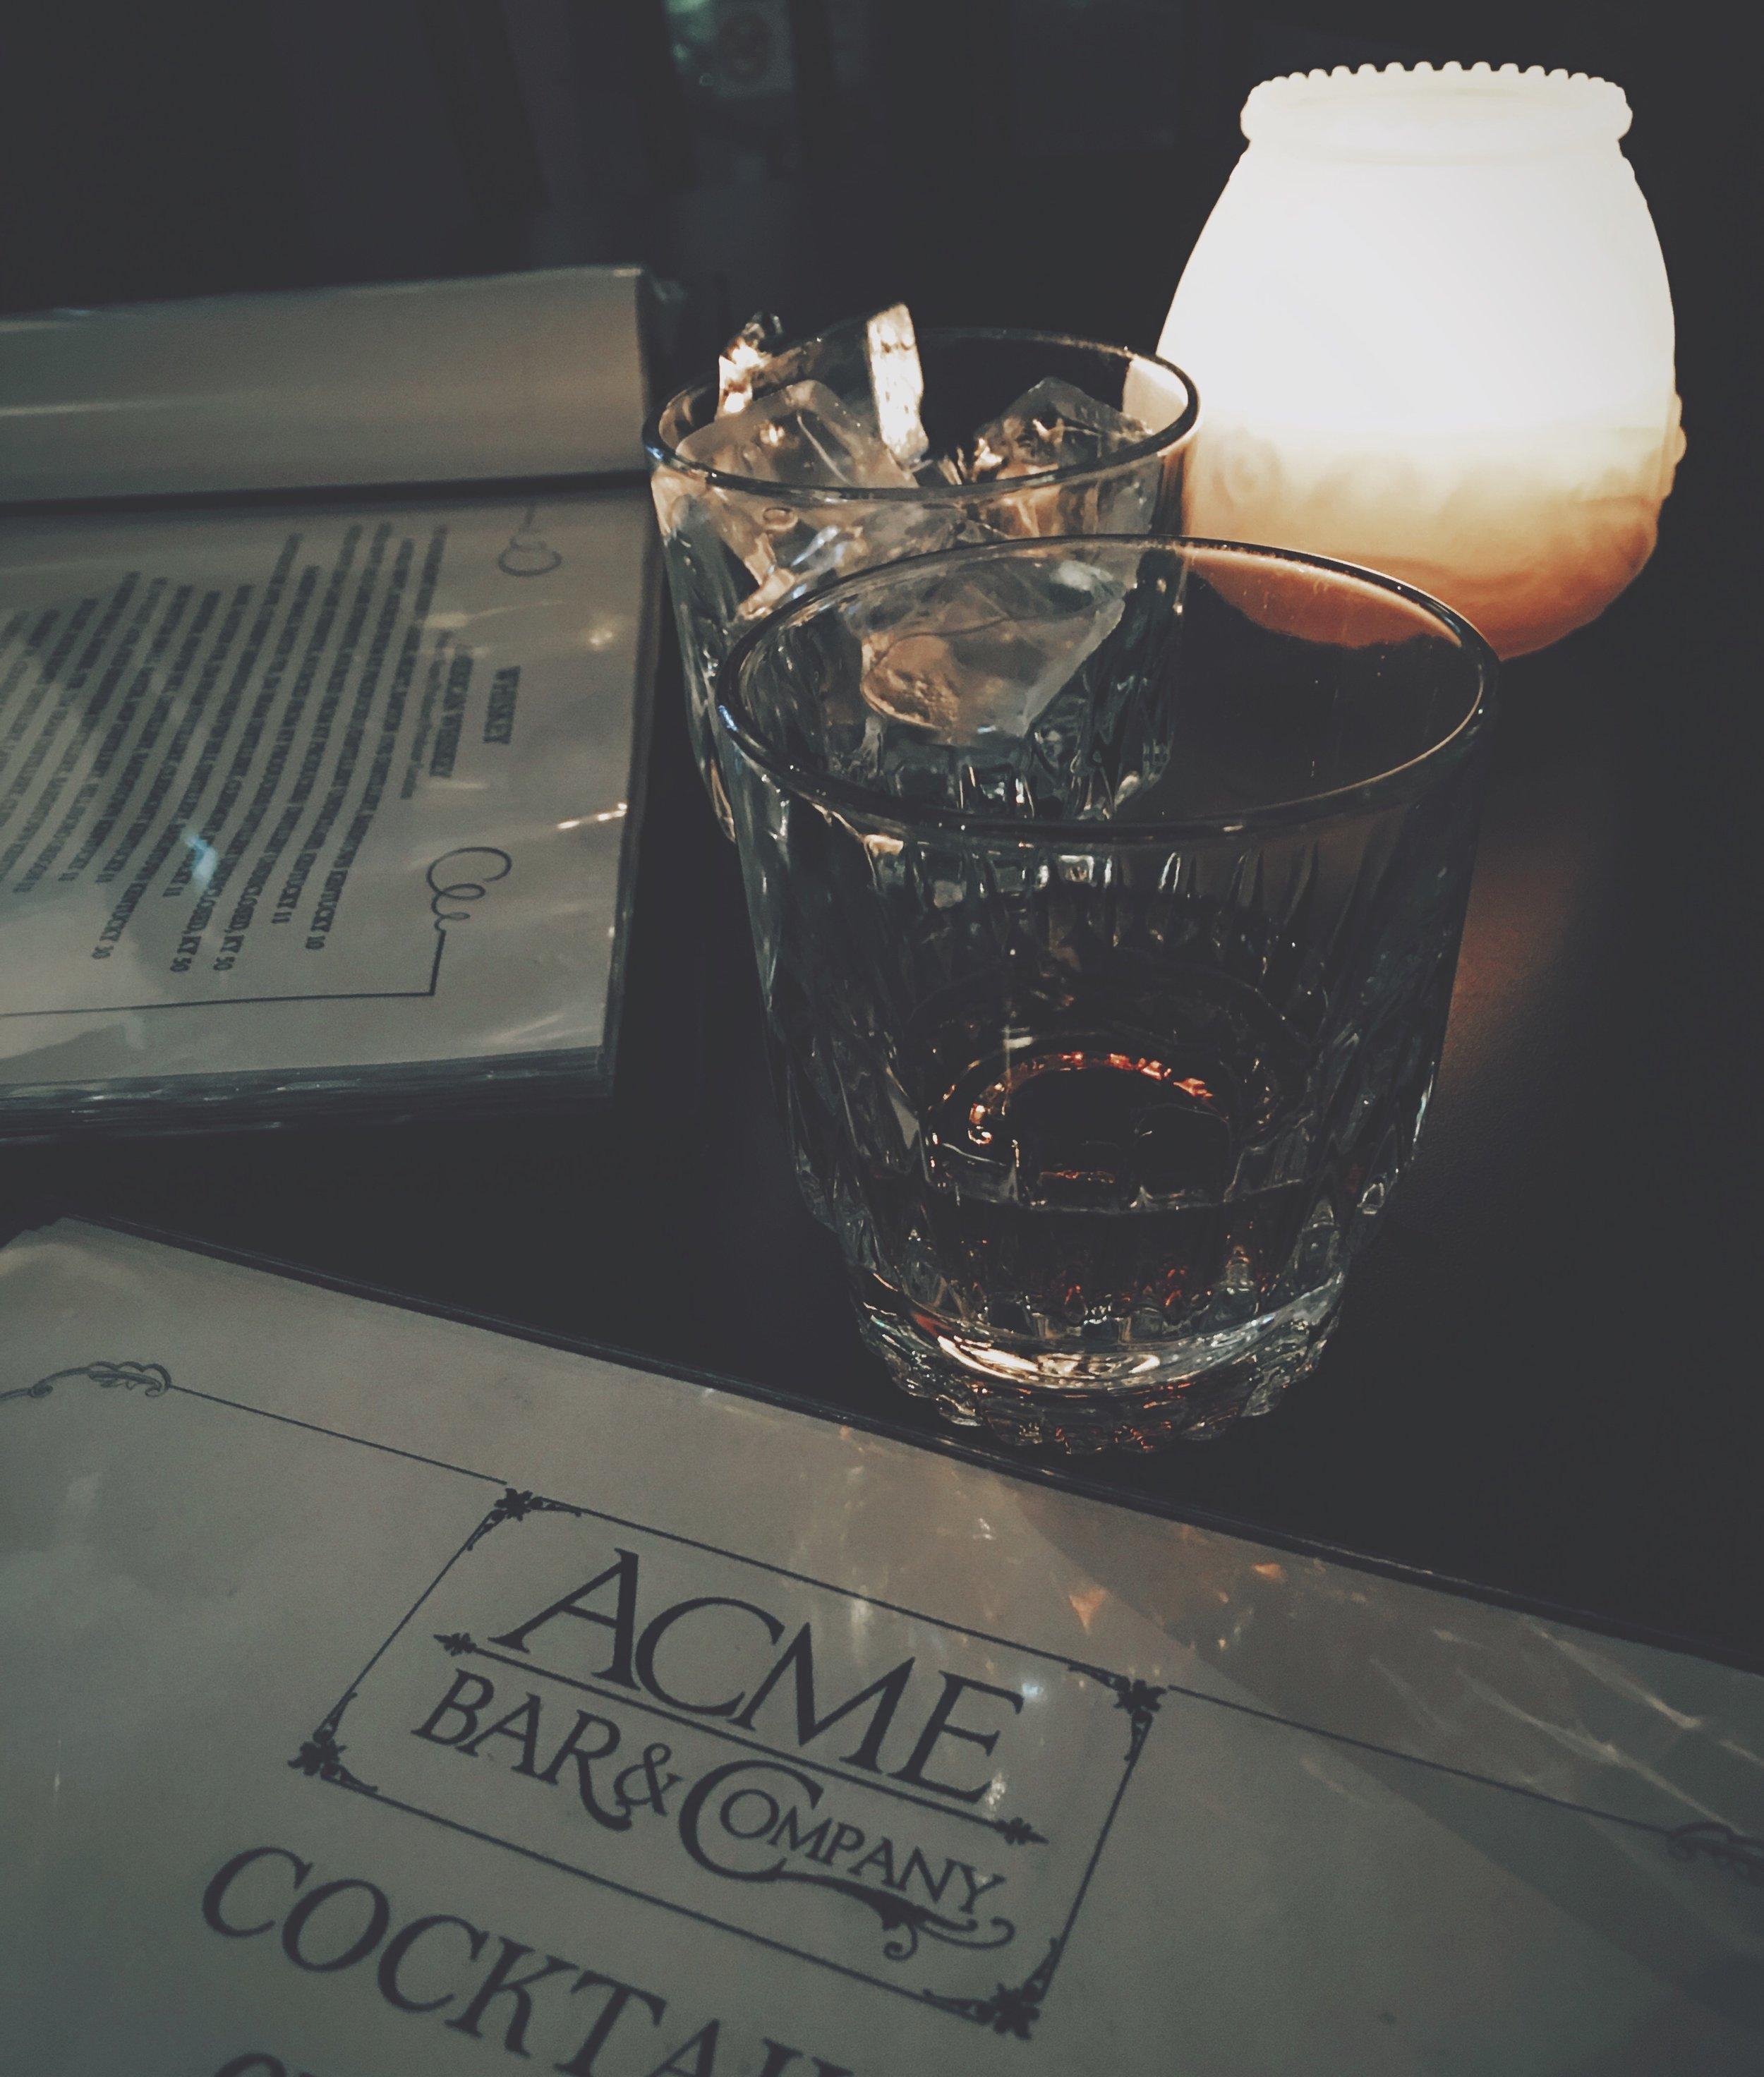 Acme4.jpg